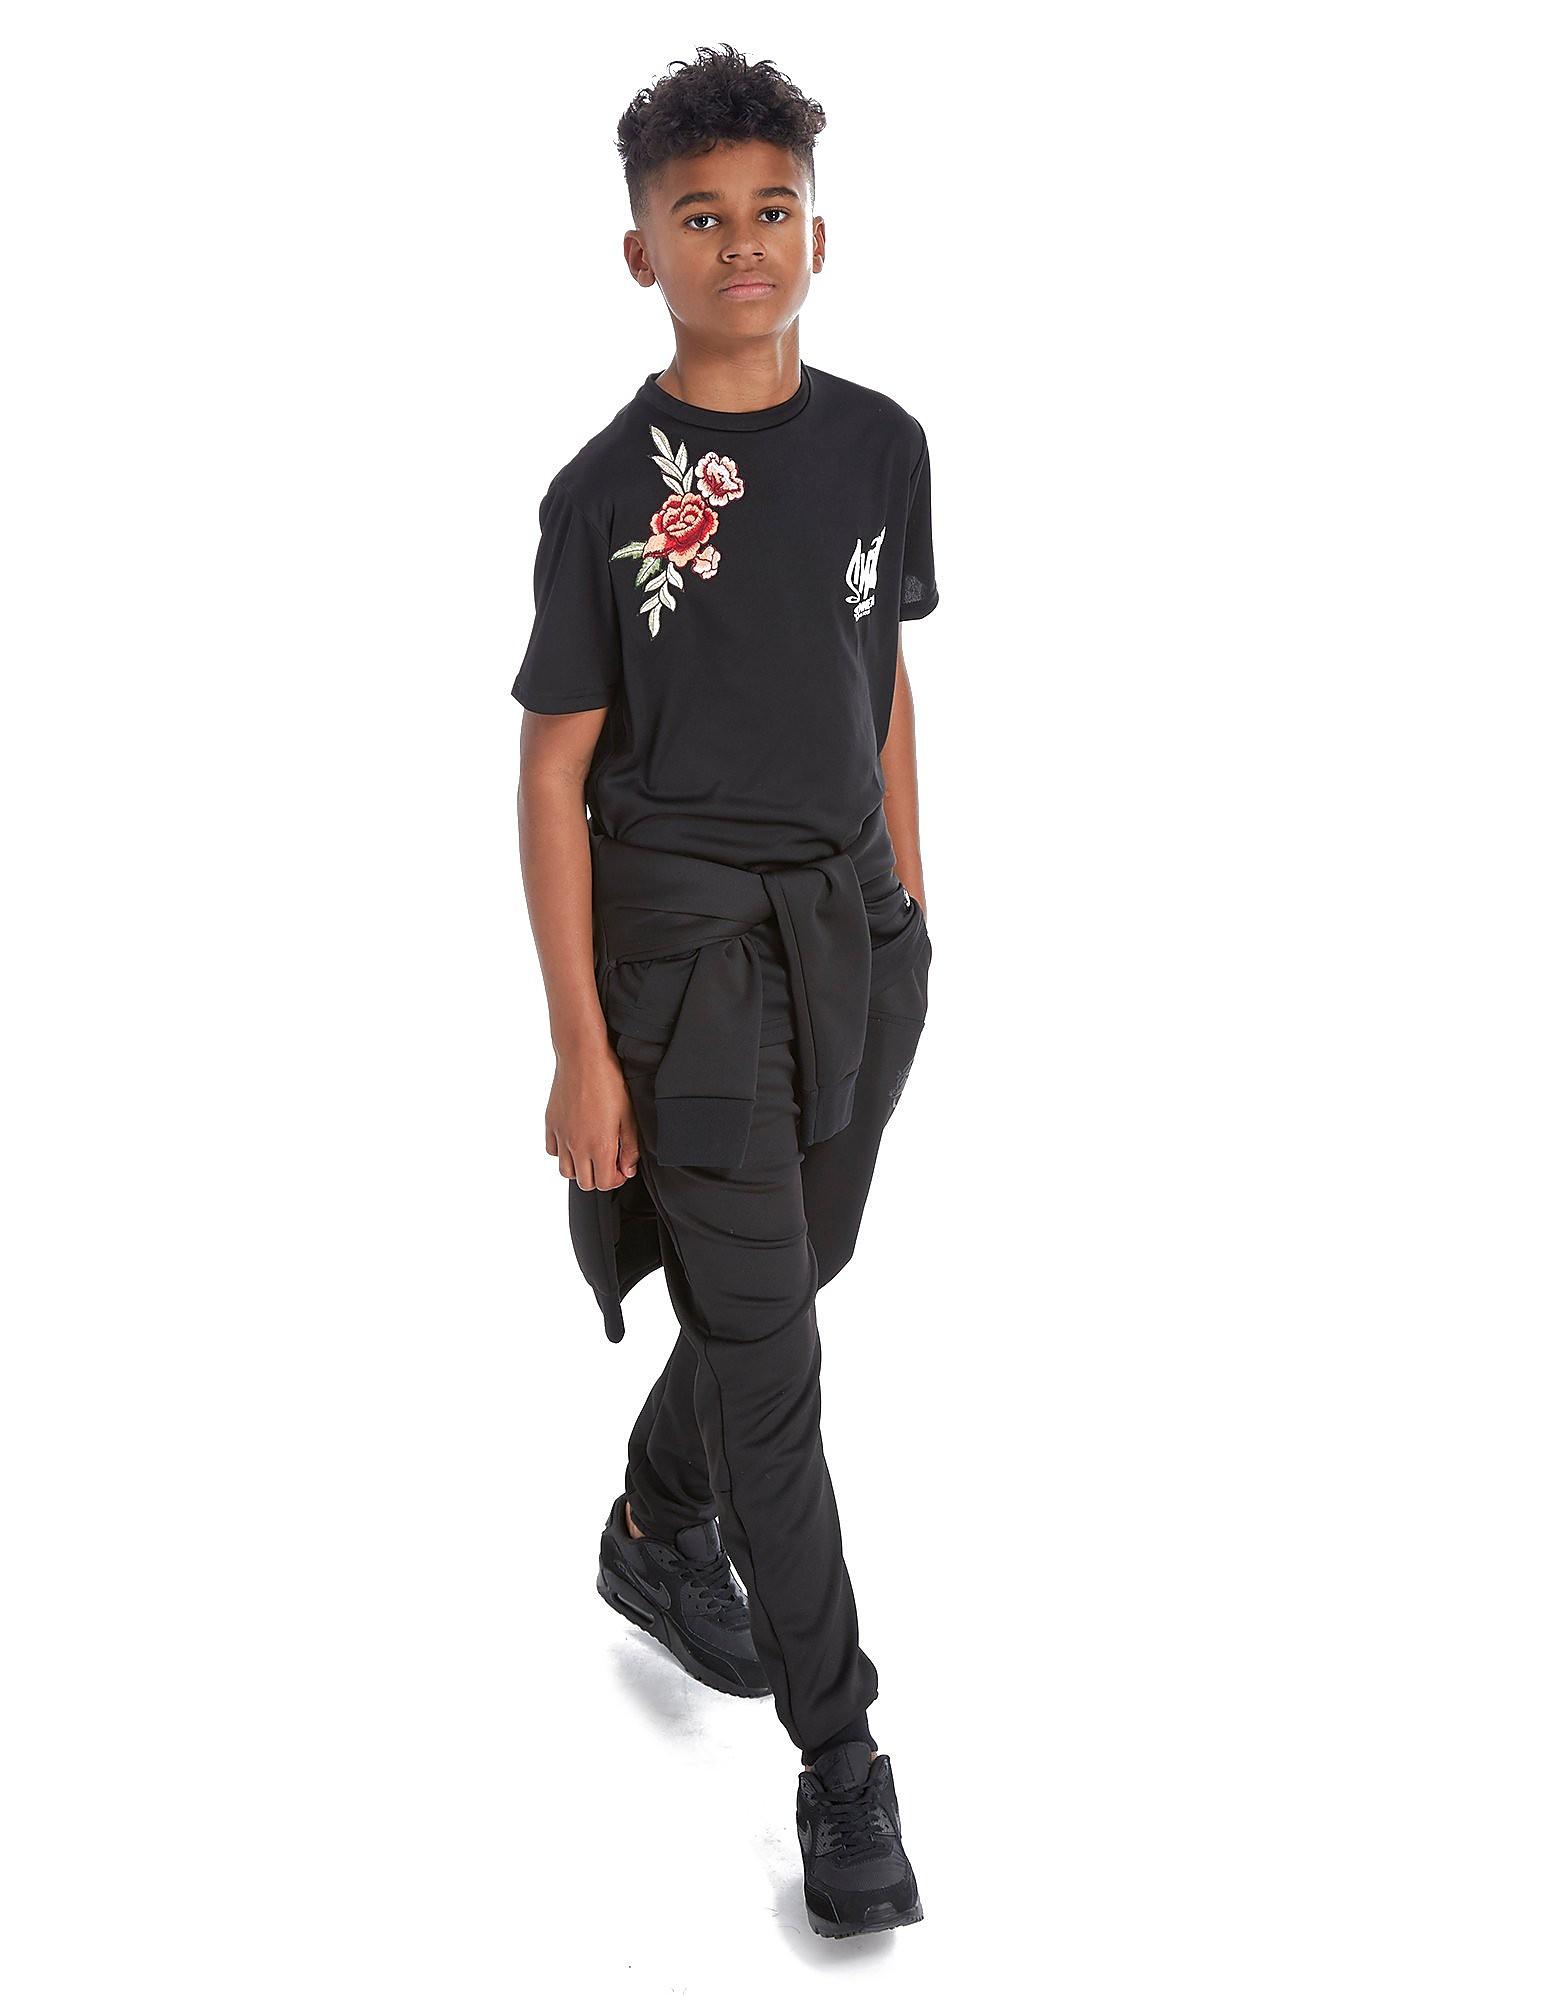 Sonneti Flower Applique T-Shirt Junior - Black, Black